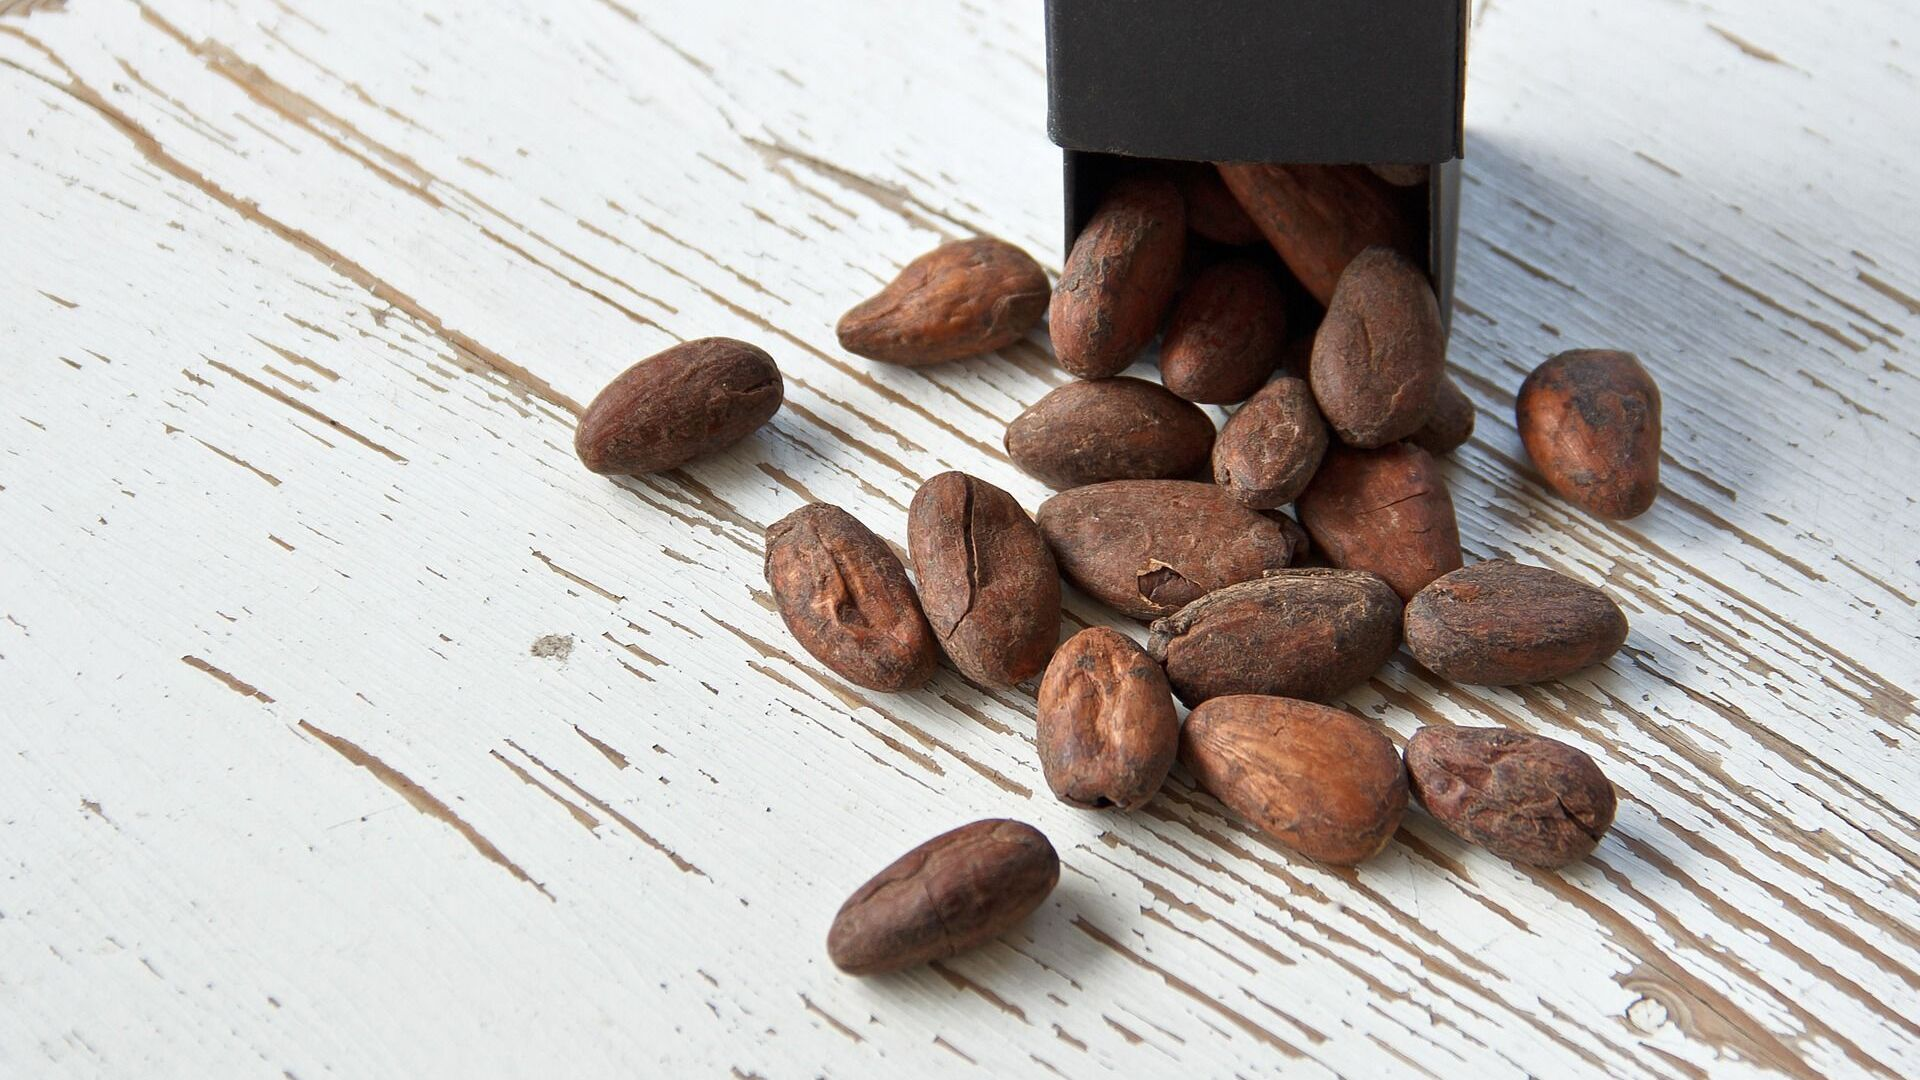 Des fèves de cacao - Sputnik France, 1920, 16.02.2021